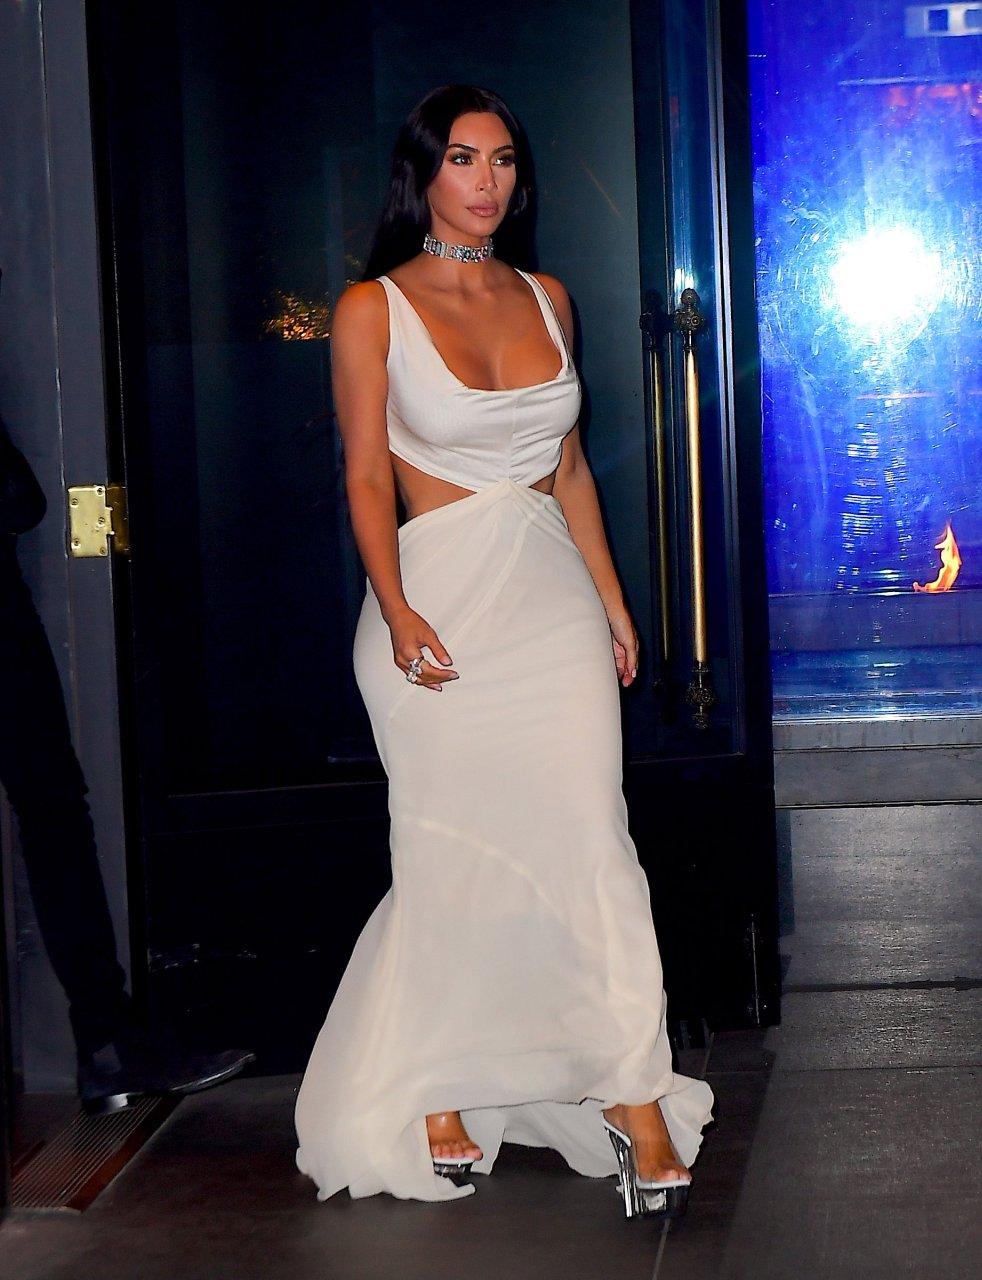 Kim-Kardashian-Sexy-TheFappeningBlog.com-32.jpg